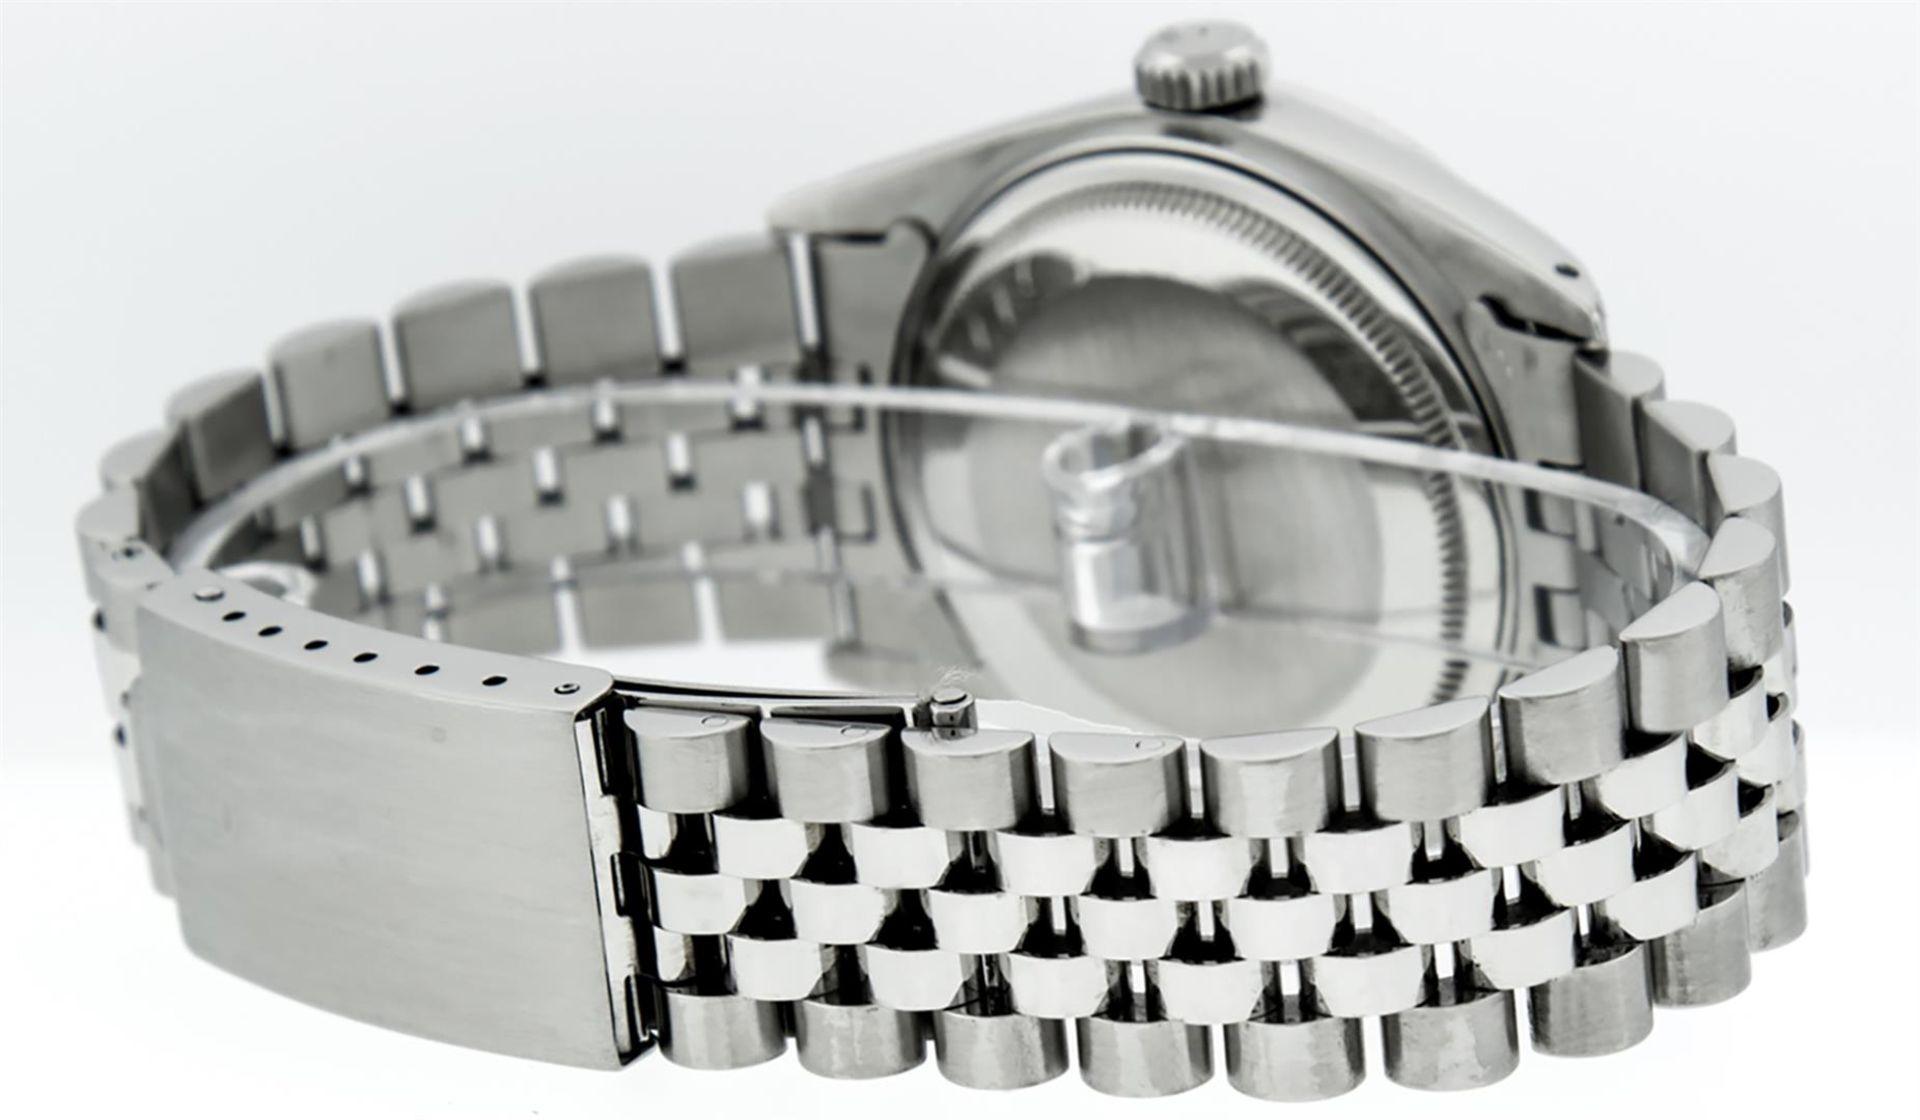 Rolex Mens Stainless Steel Diamond Lugs & Ruby Datejust Wristwatch - Image 4 of 8